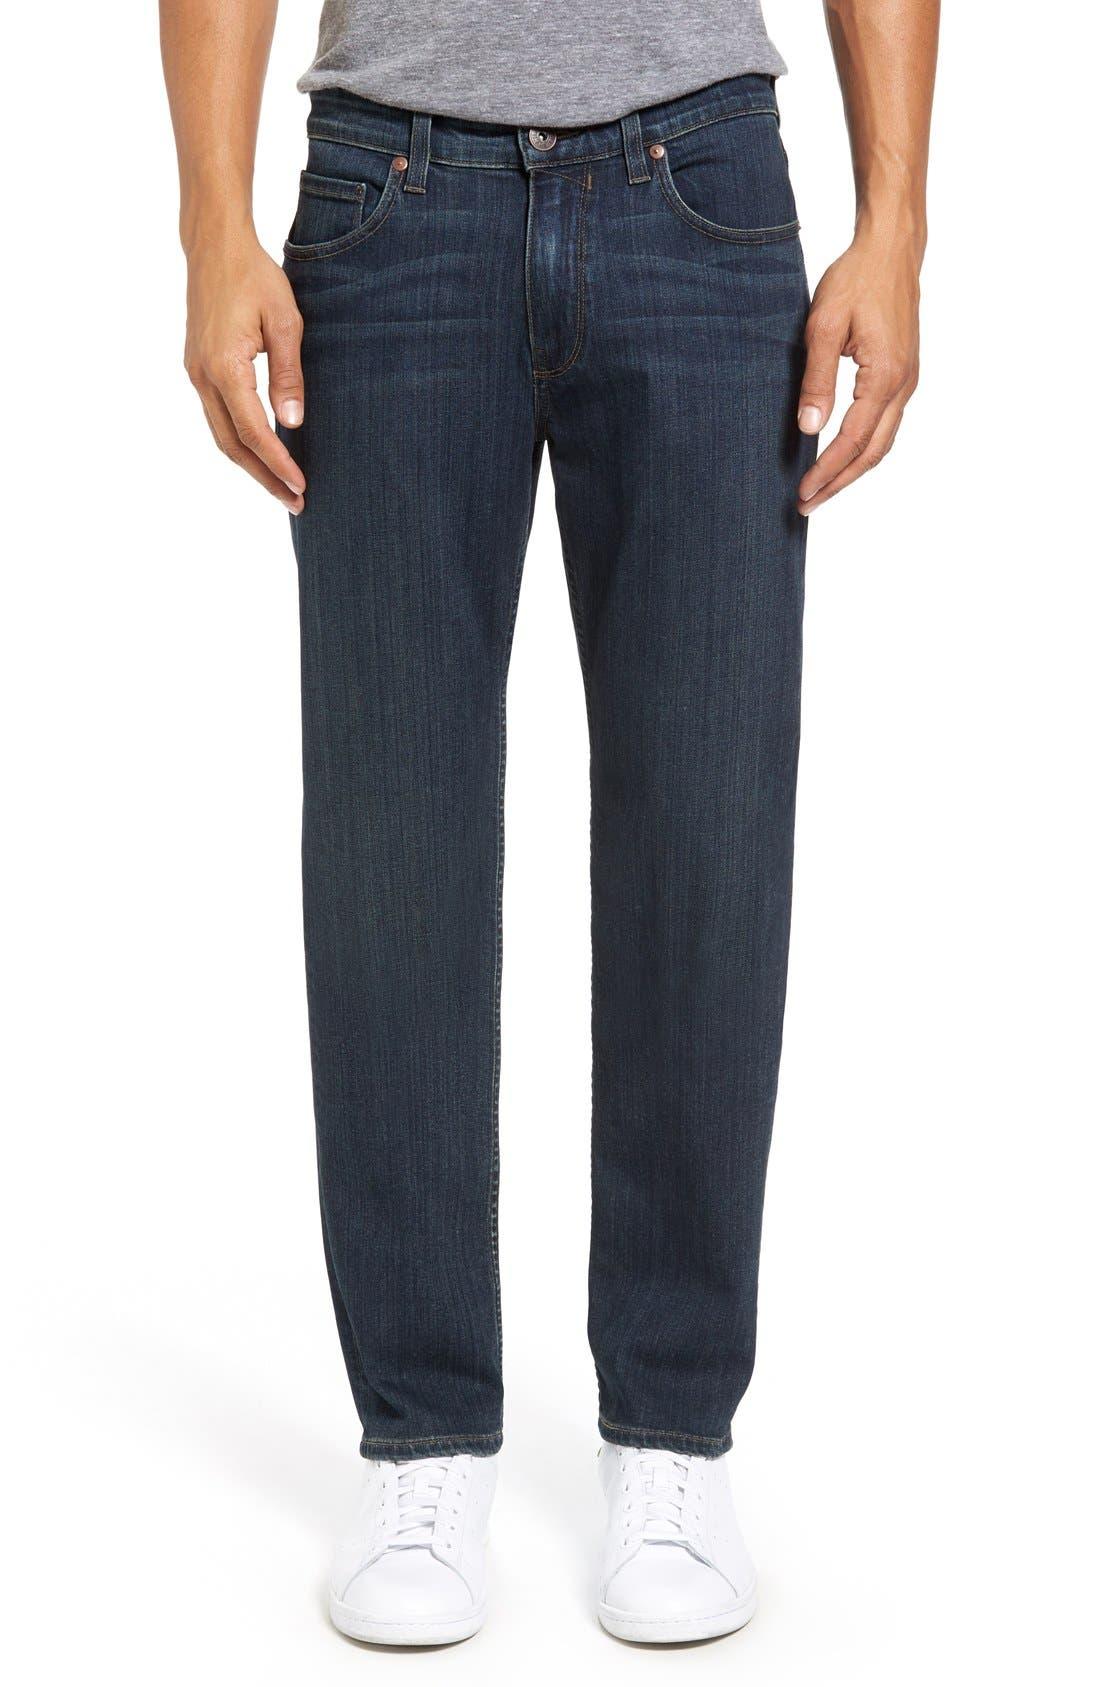 Transcend - Federal Slim Straight Leg Jeans,                         Main,                         color, Rand